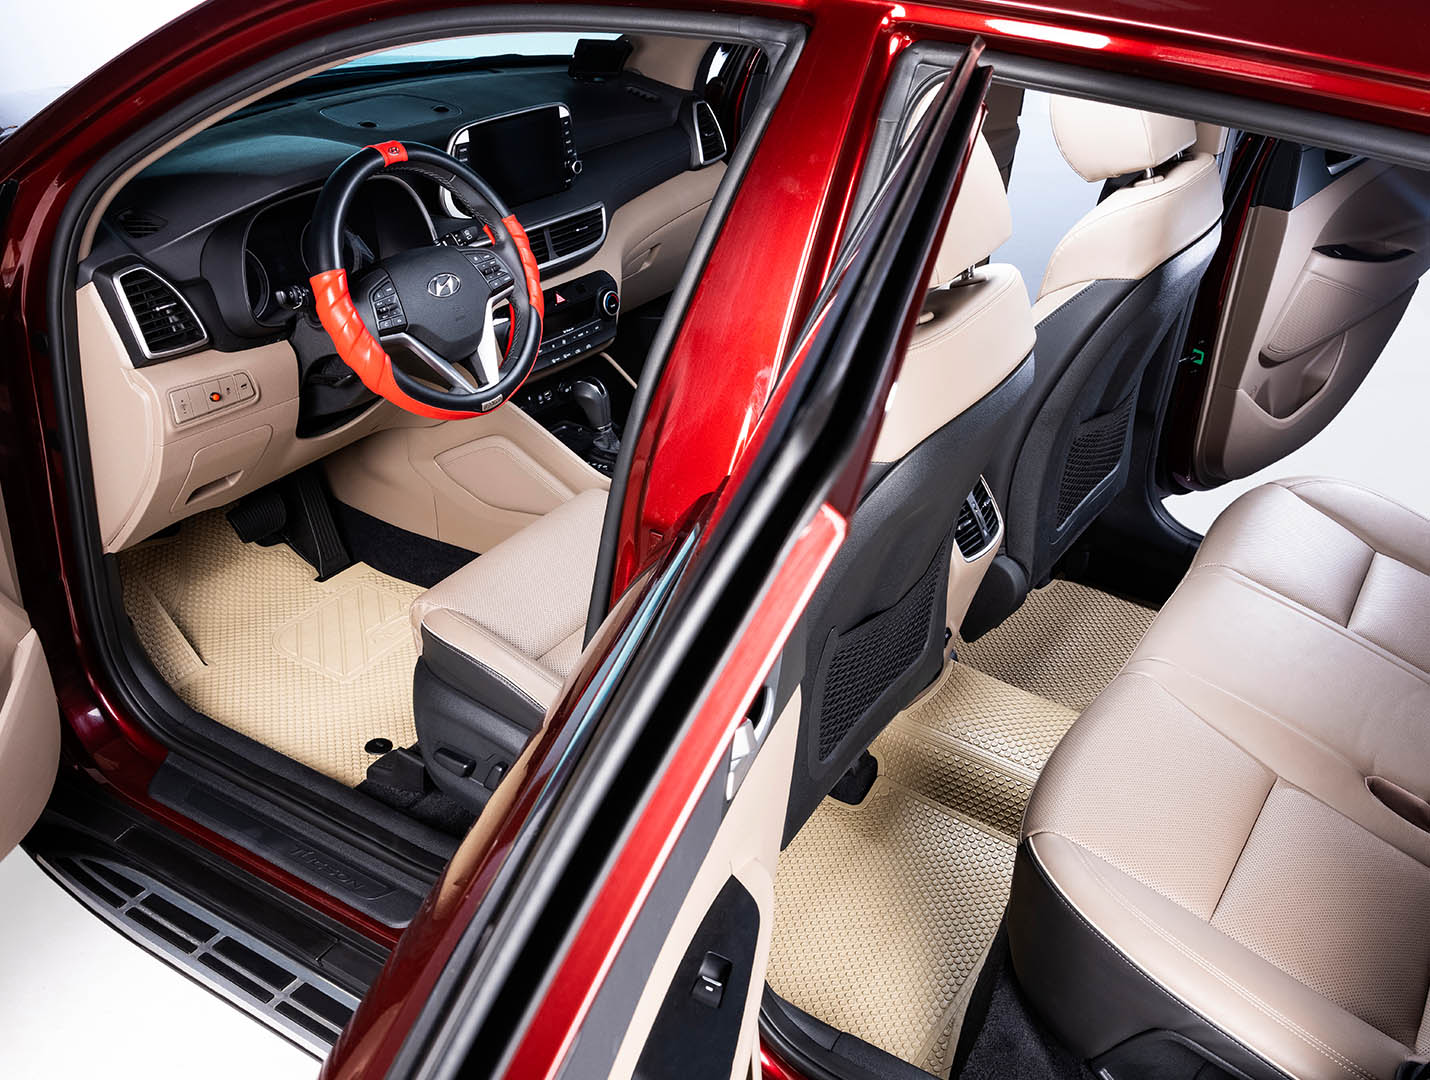 Thảm lót sàn Hyundai Tucson bản KATA Pro